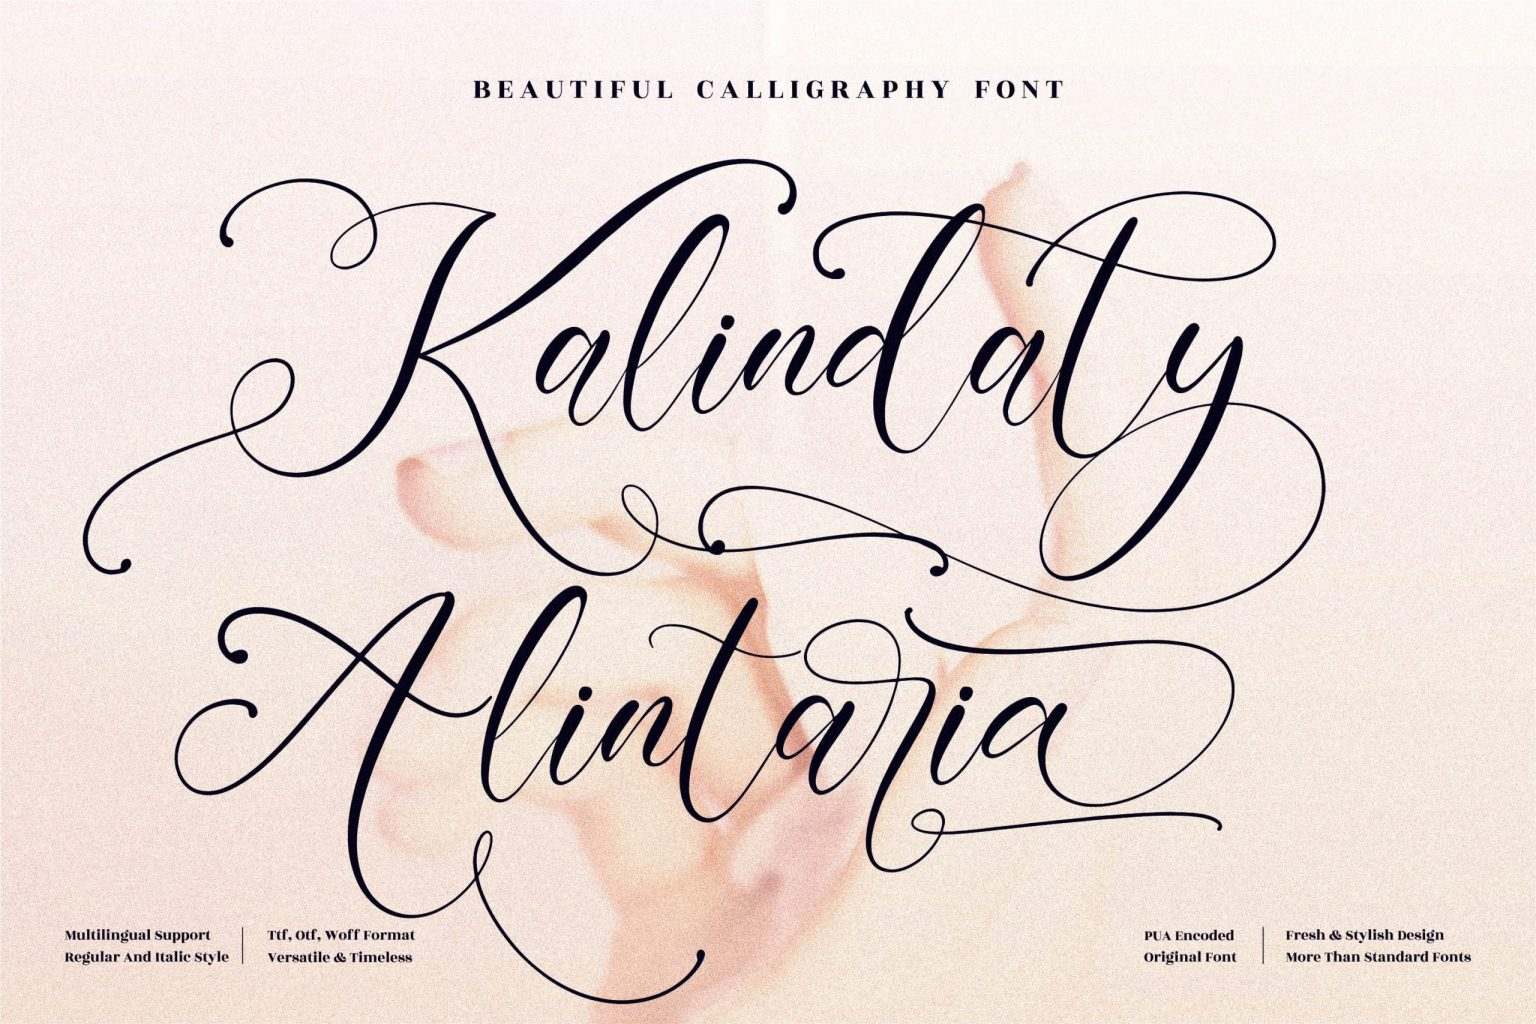 Kalindaty Alintaria Calligraphy Font